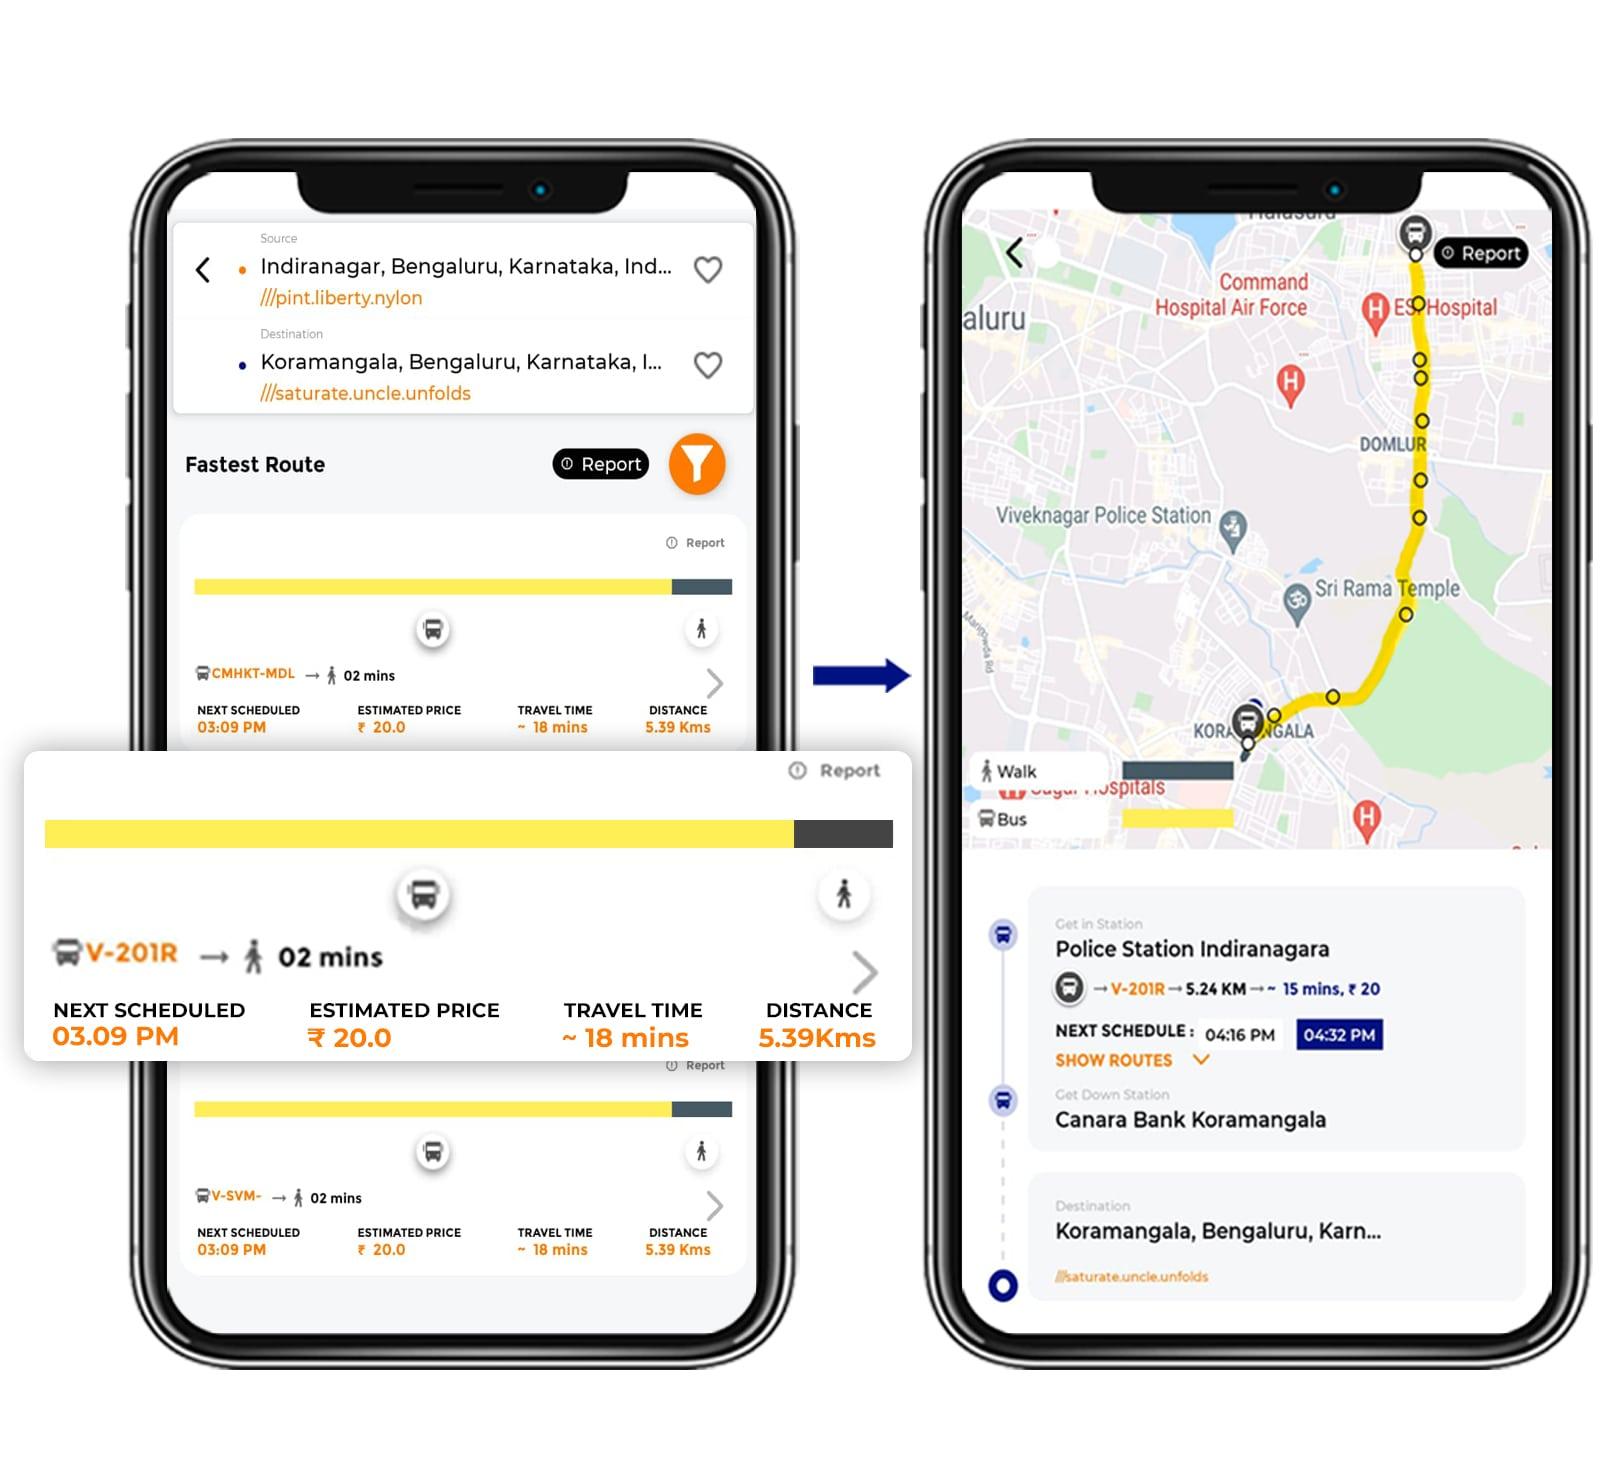 Tummoc app, Tummoc, Public transportation, Indiranagar, Kormangala